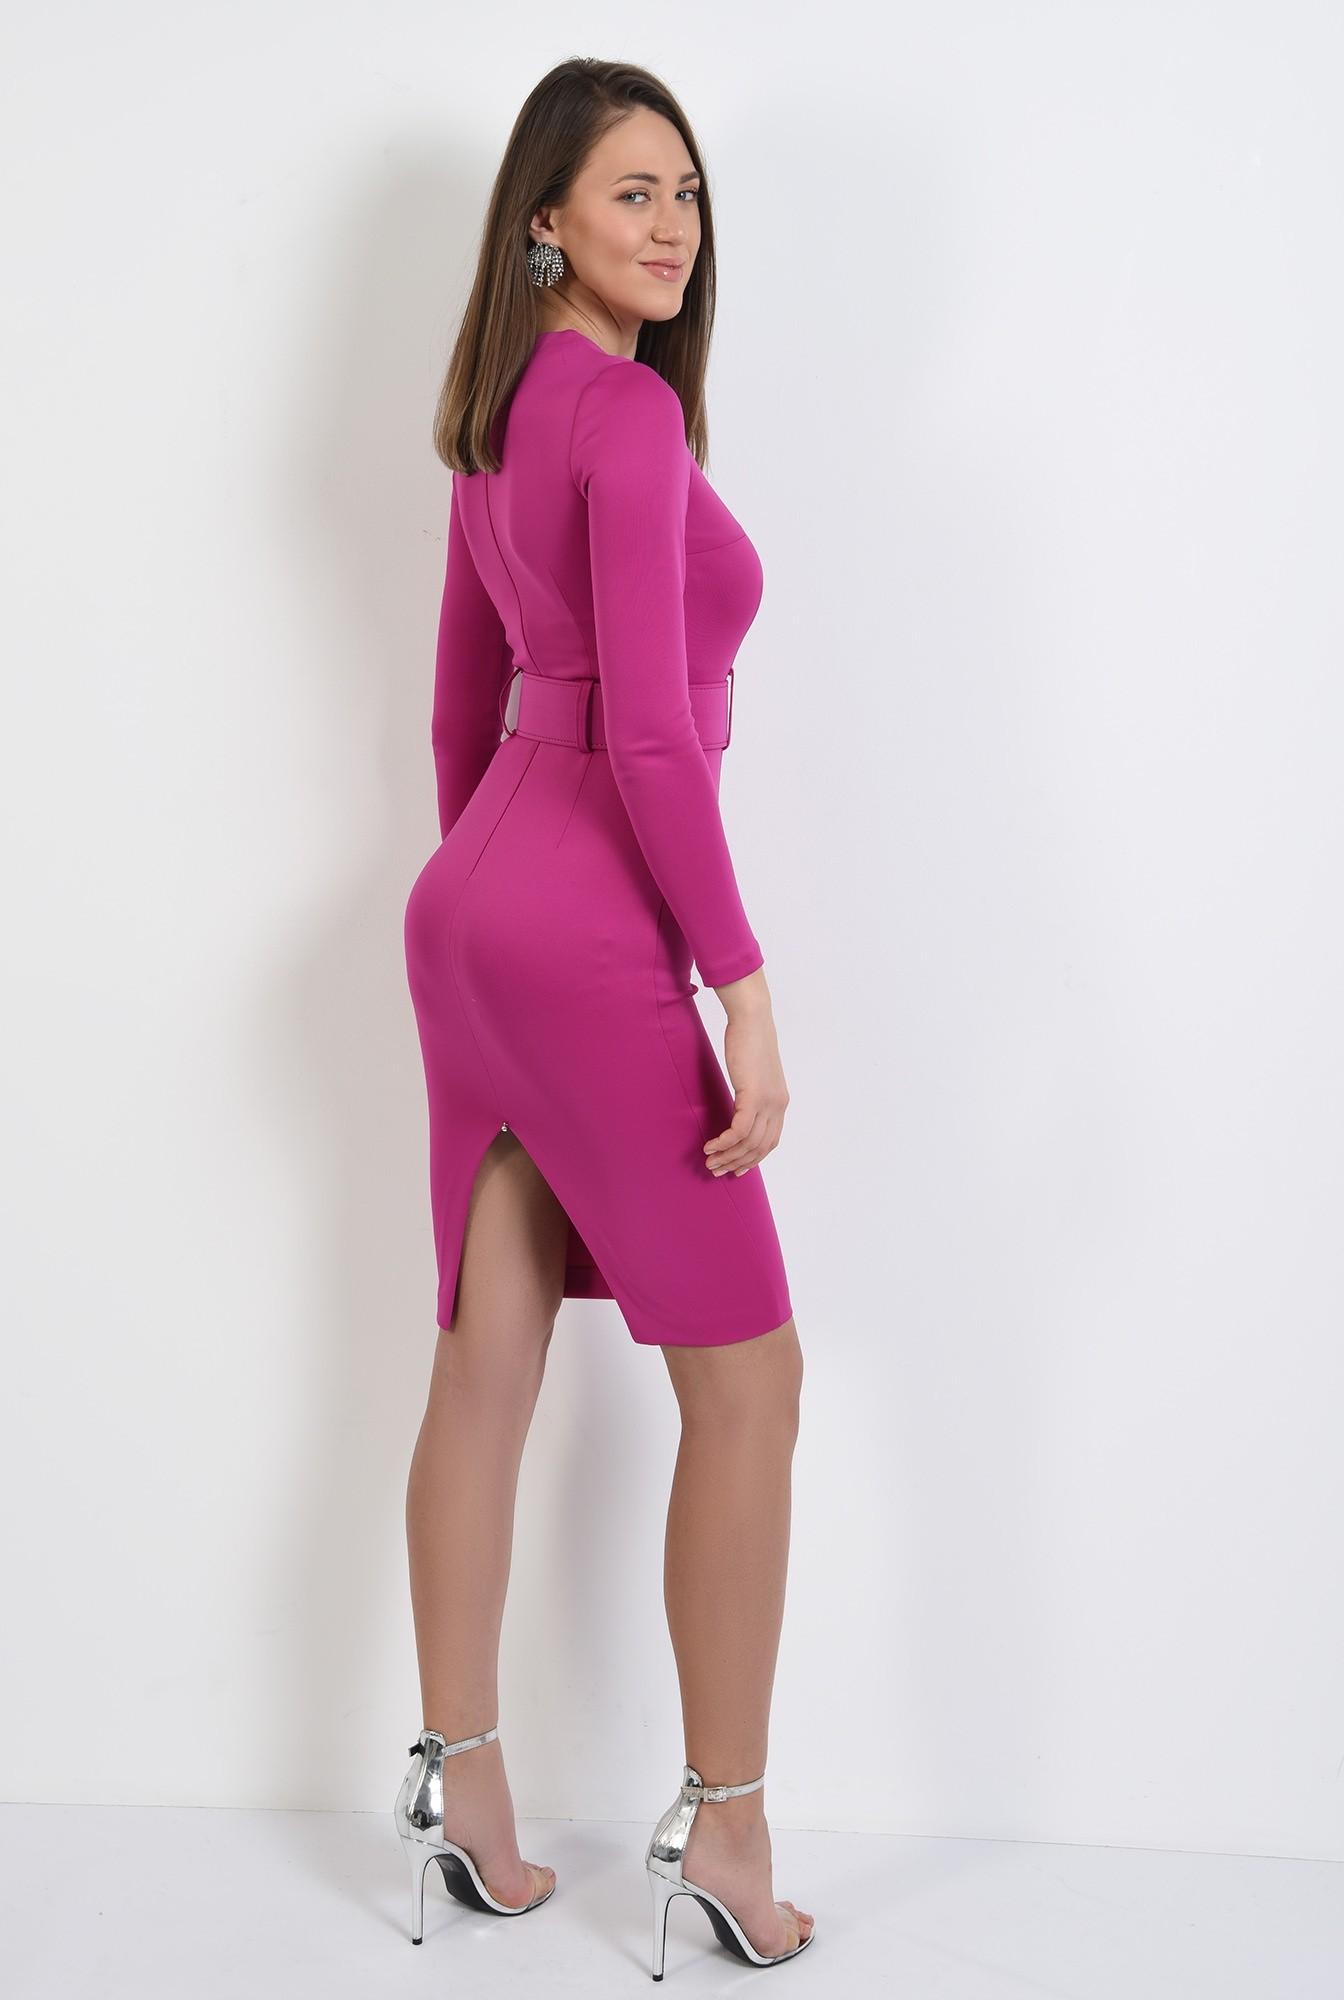 1 - 360 - rochie eleganta, midi, conica, cu centura, rochie de ocazie